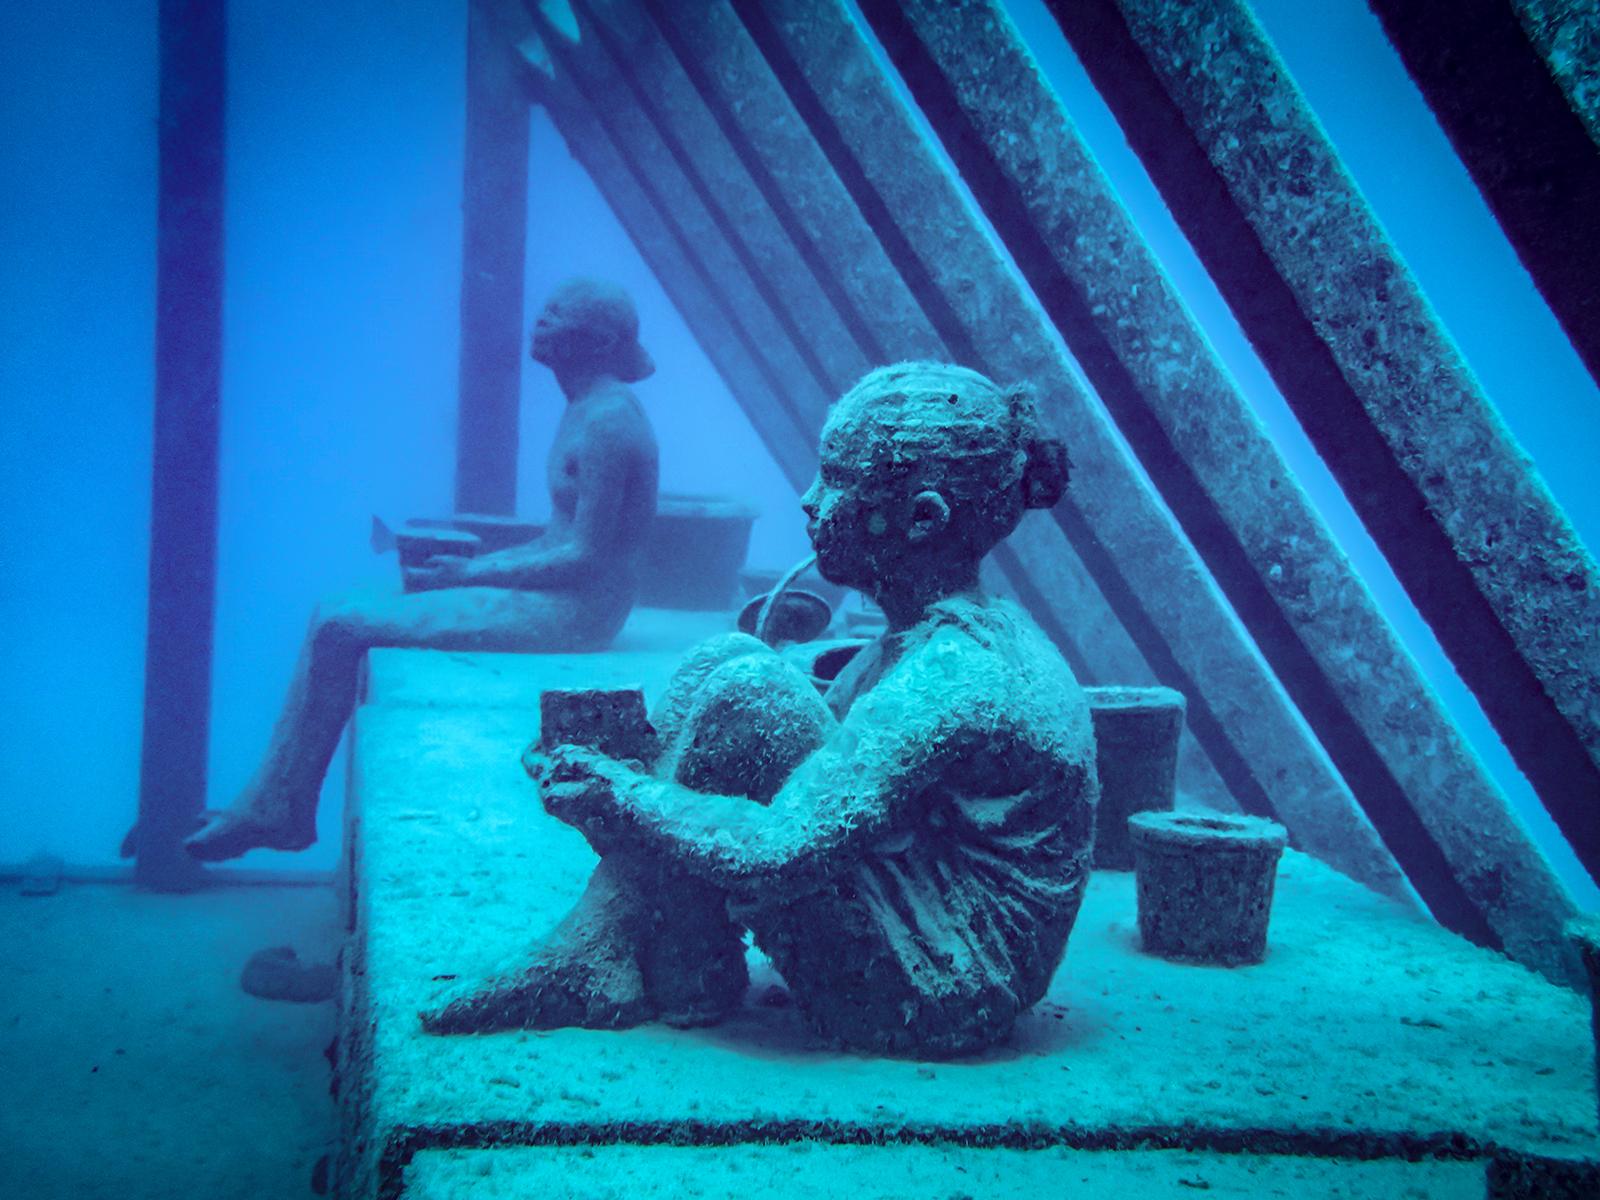 Underwater sculptures at Australia's new Underwater Gallery museum